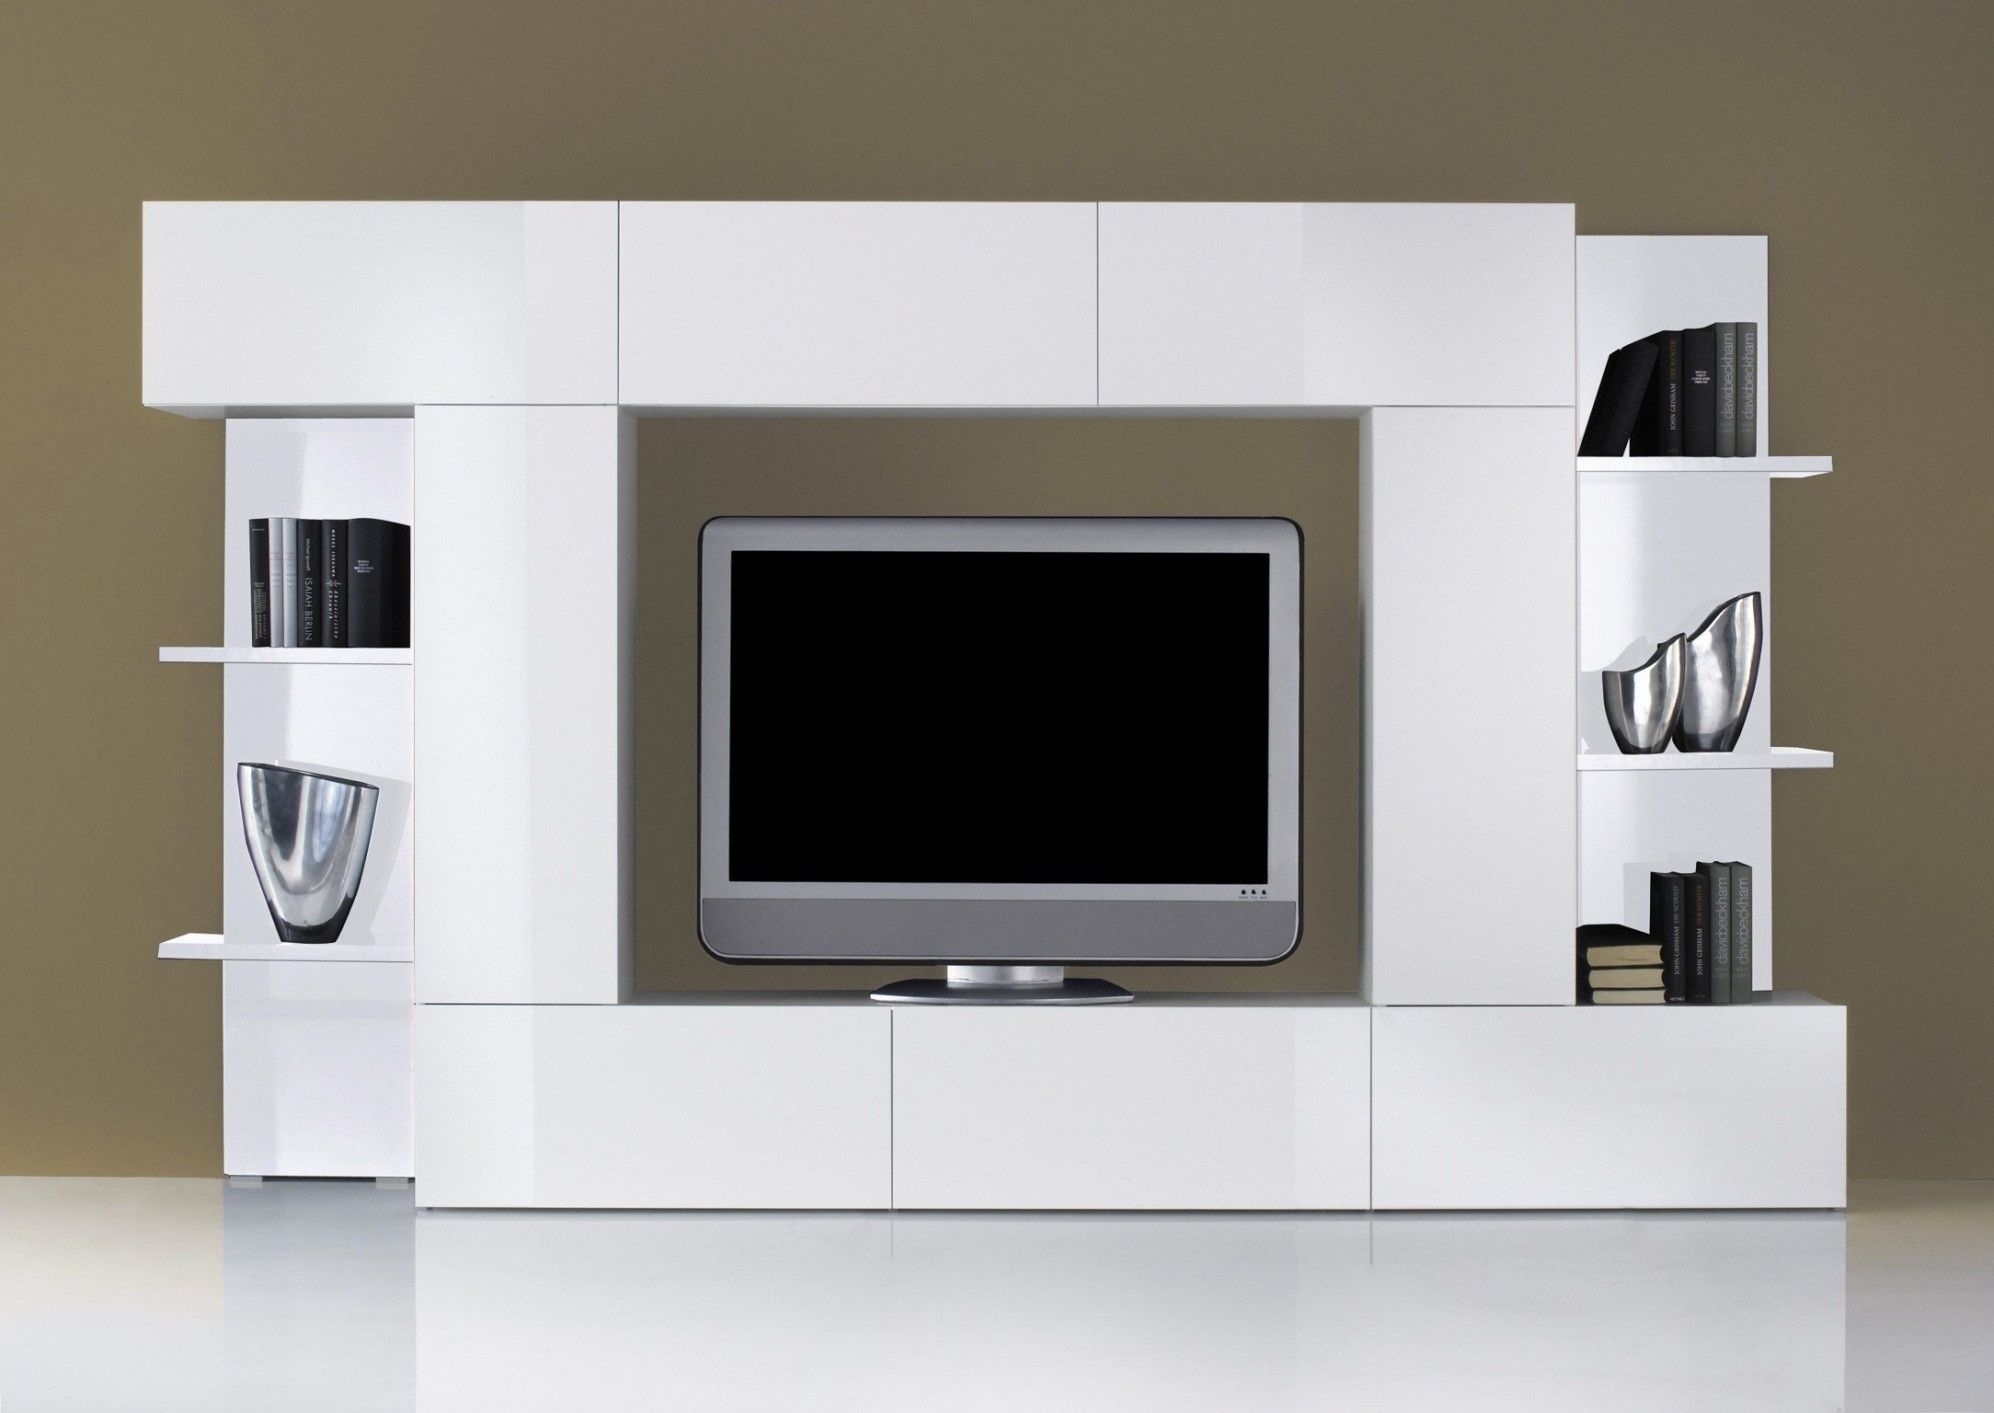 10 Design Meuble Tv Acacia Modele Modern Tv Units Built In Tv Wall Unit Tv Unit Design